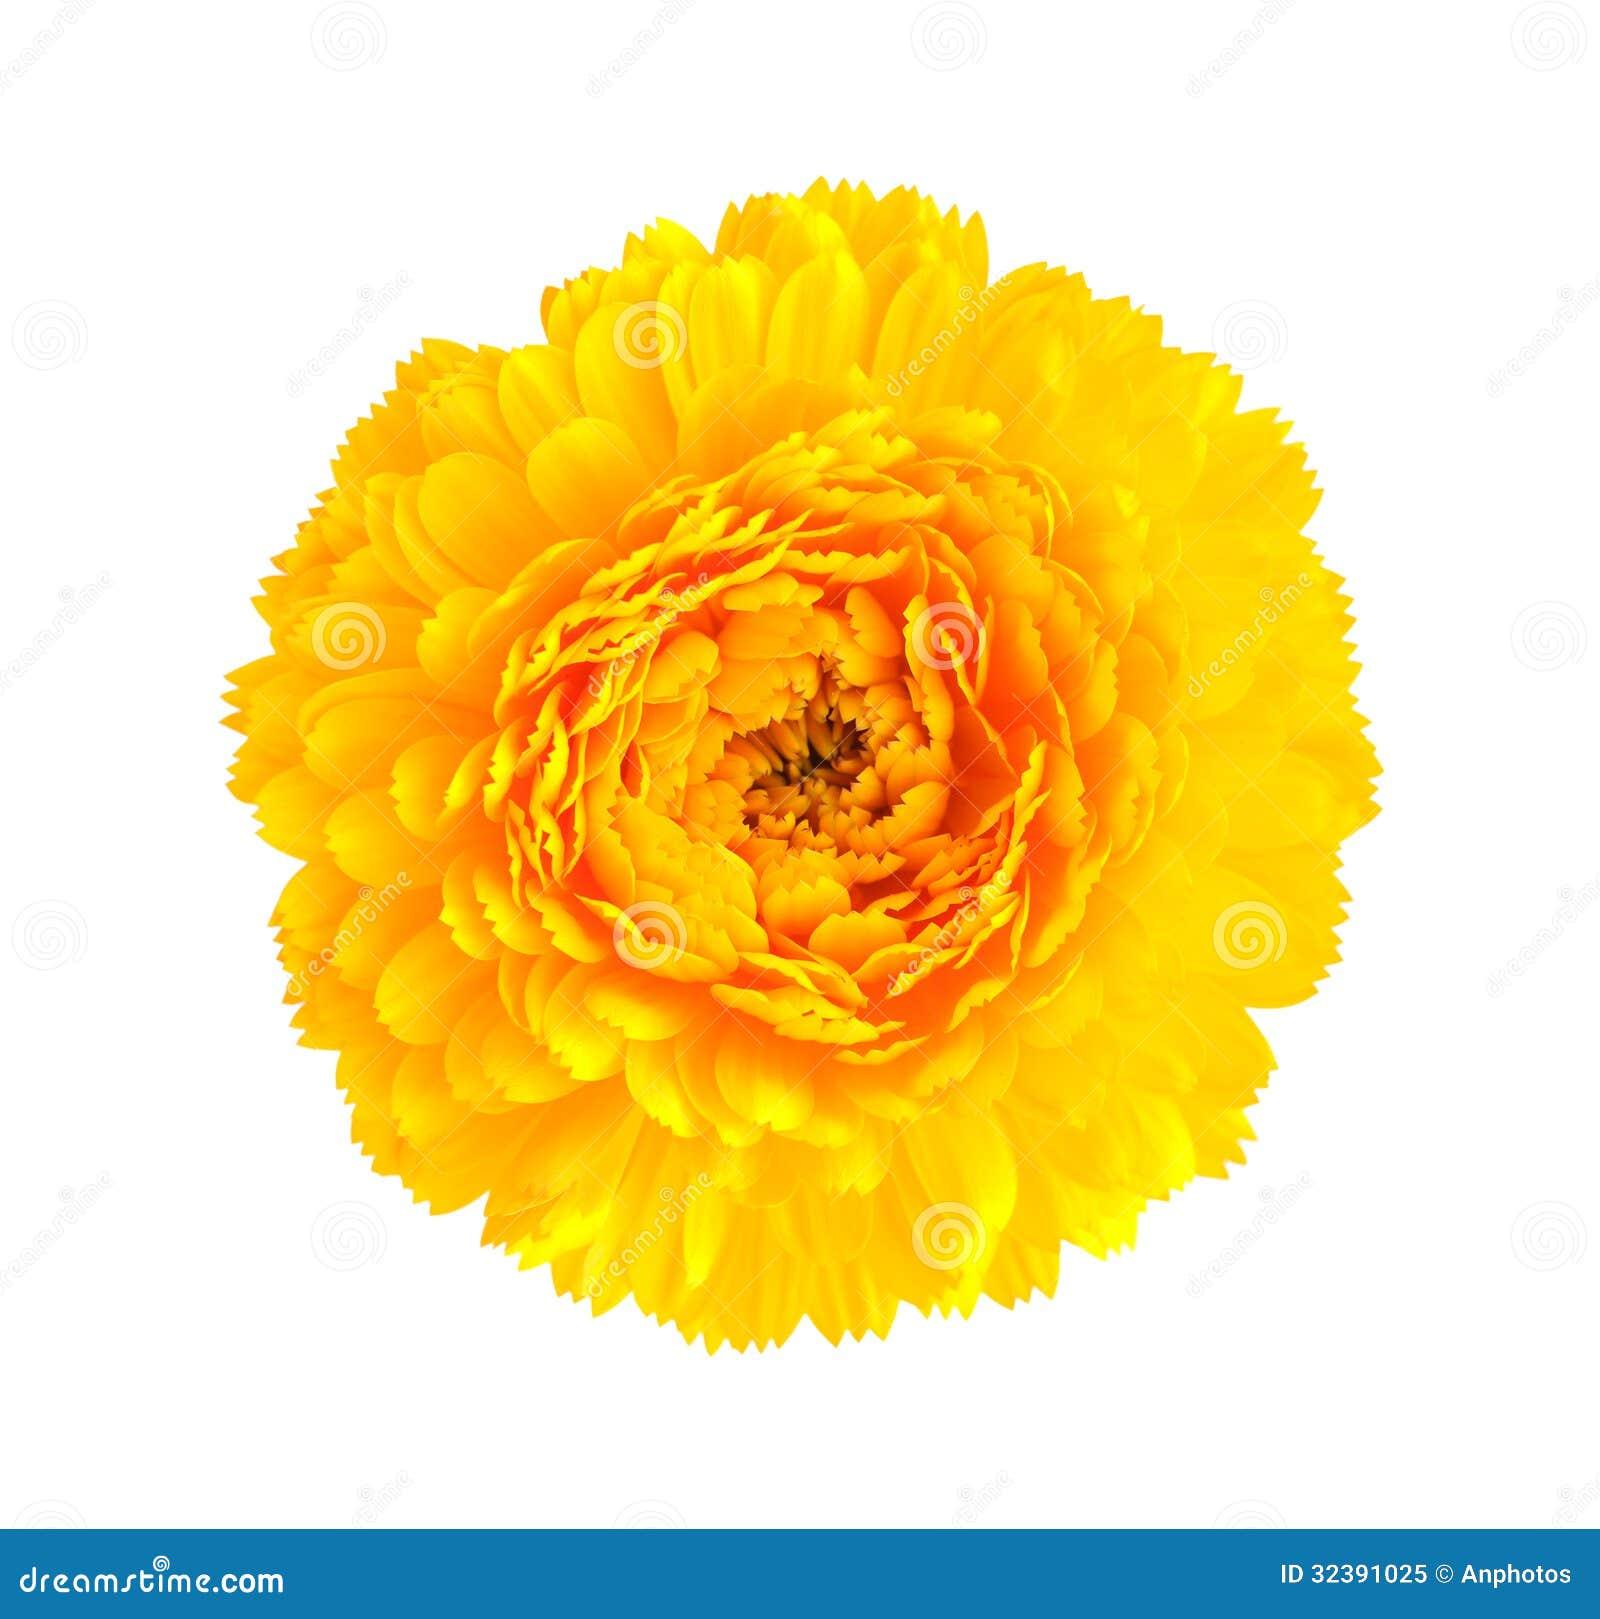 Yellow Chrysanthemum Flower Stock Image Image Of White Flower